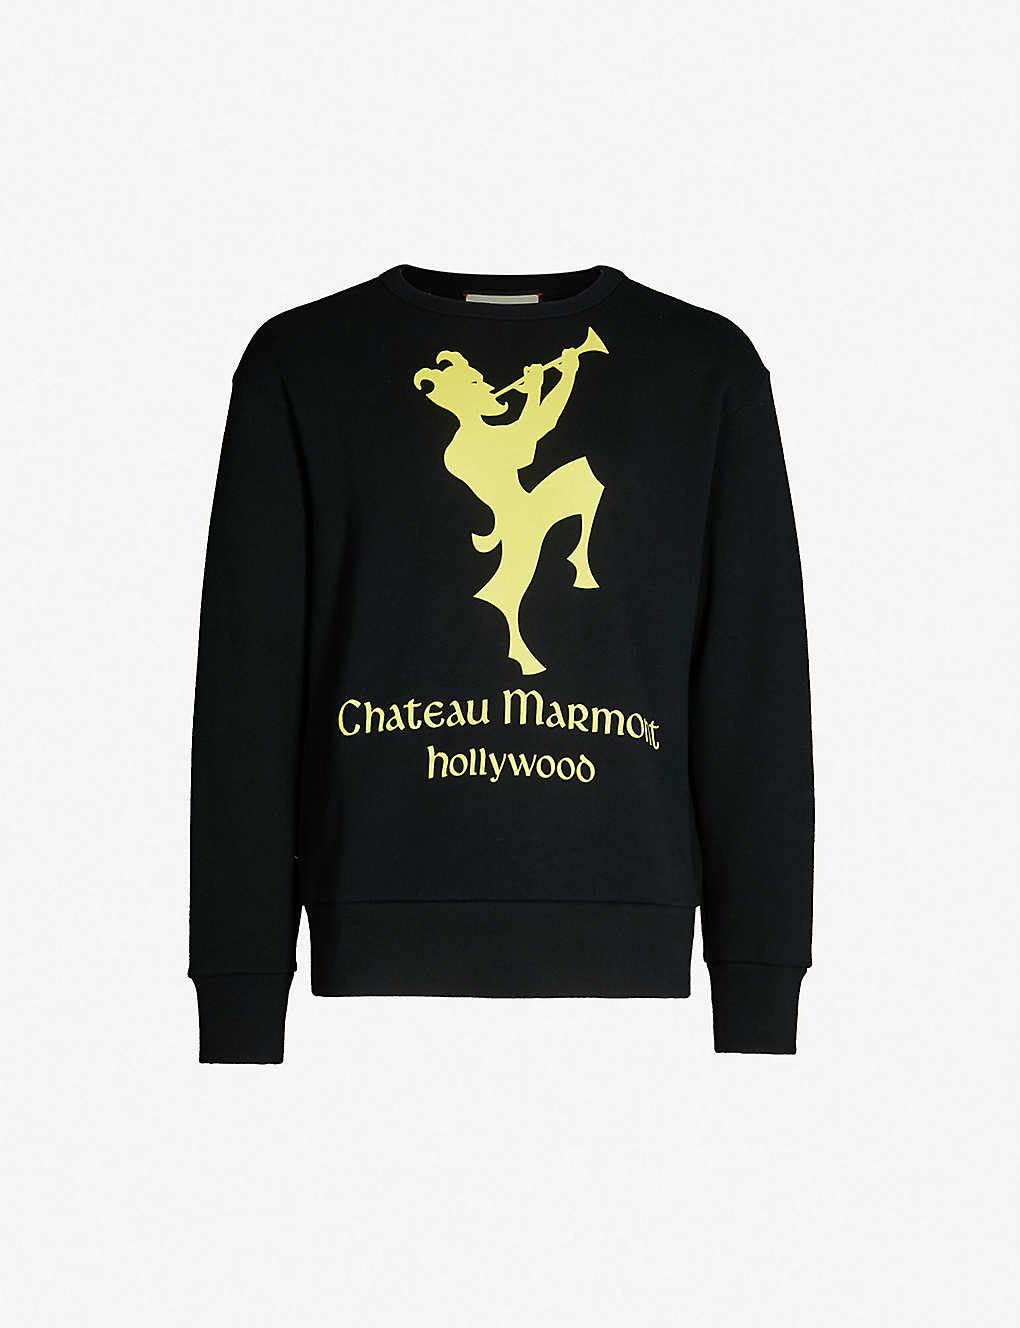 0b06b111ed8a GUCCI - Chateau Marmont cotton-jersey T-shirt | Selfridges.com